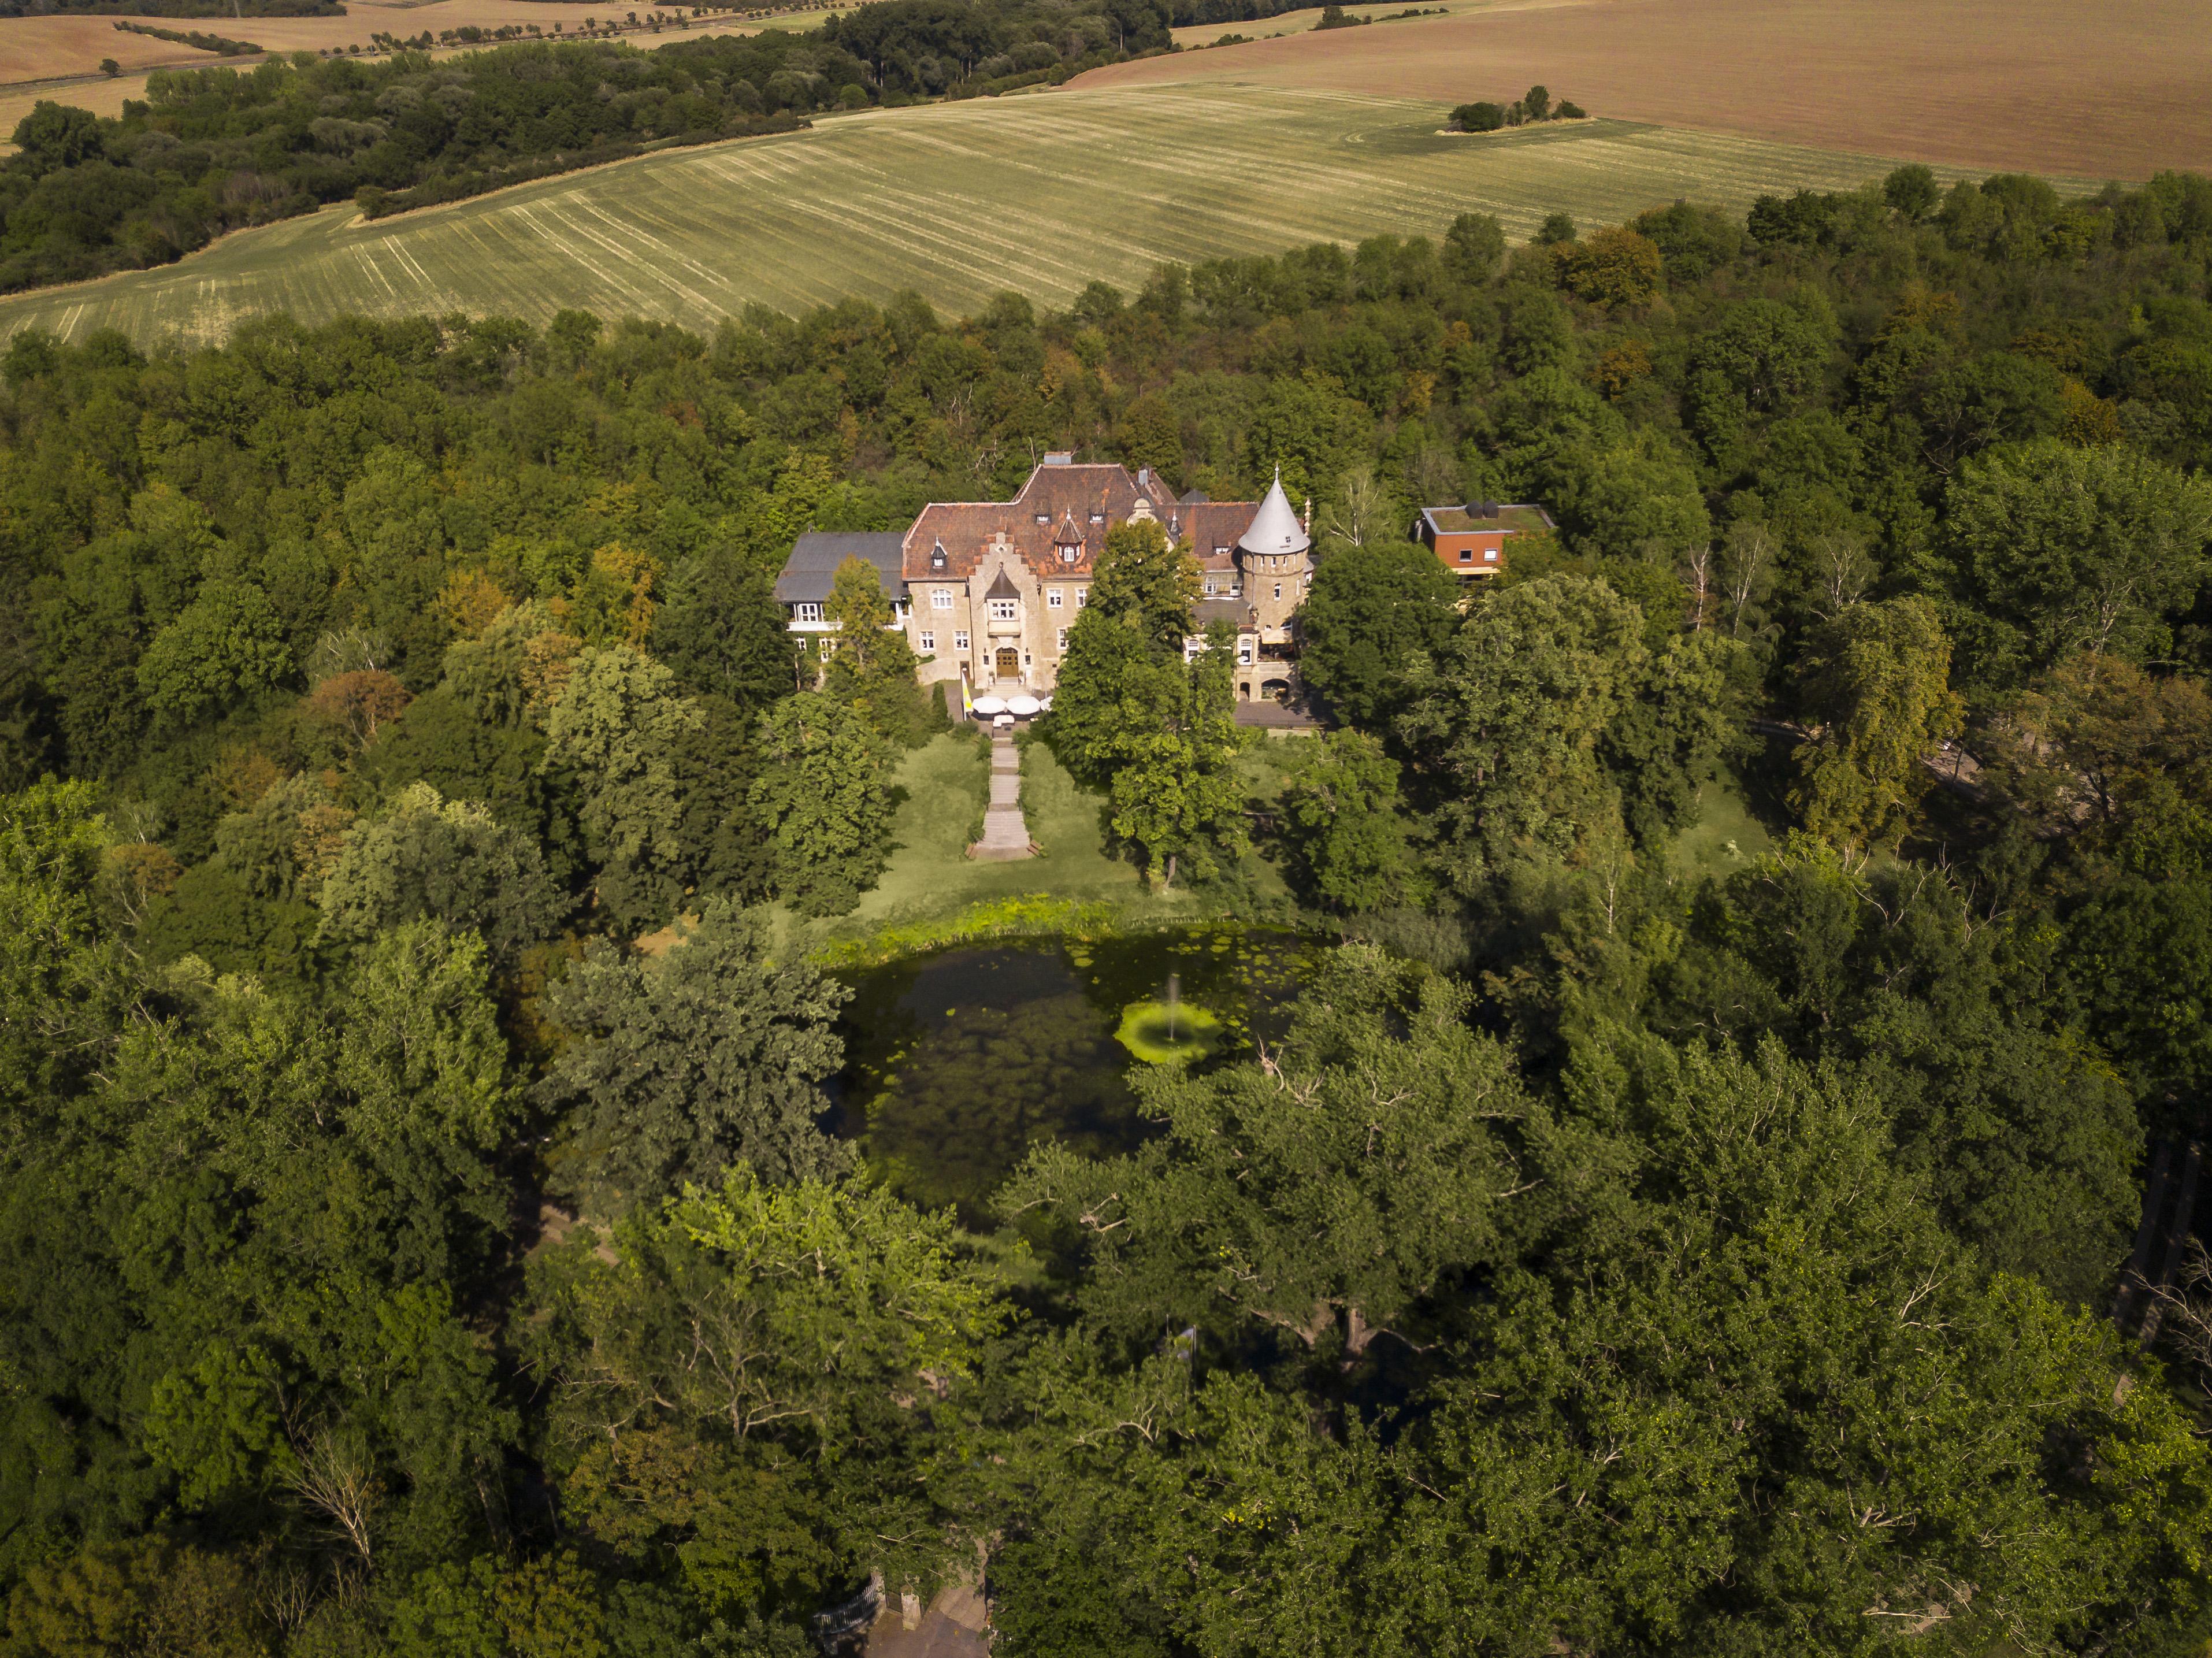 Villa Westerberge in Aschersleben